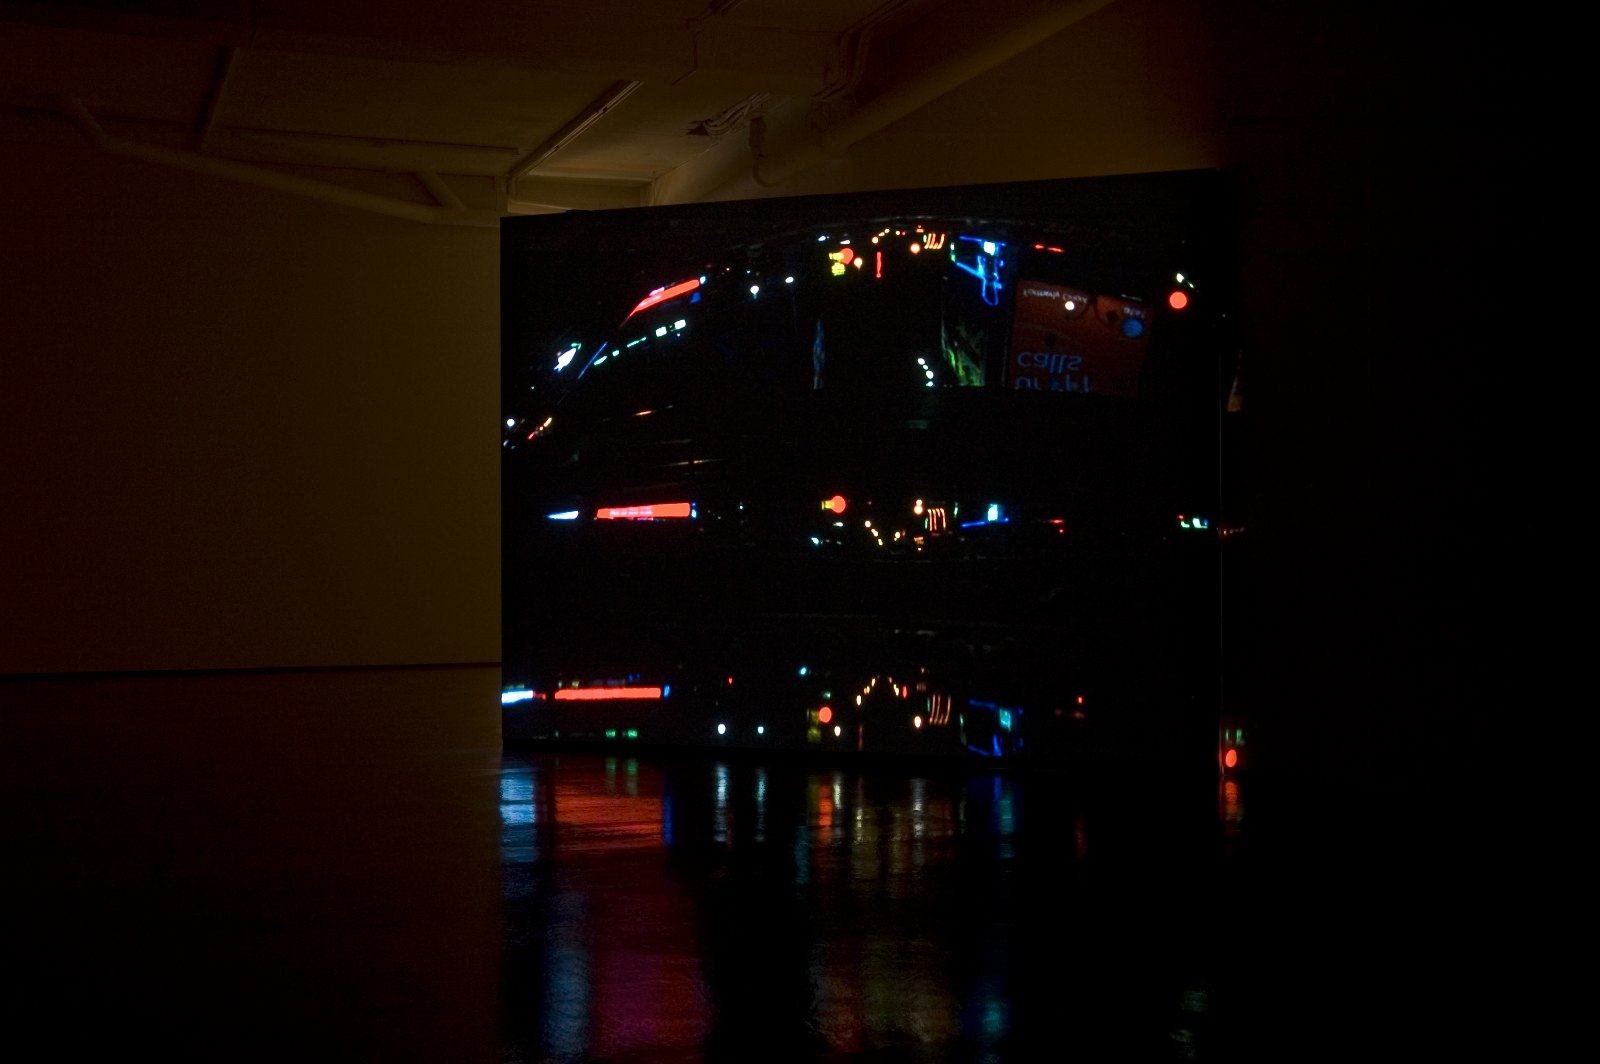 Skin flick, 2008, 16 mm color film transferred to HD video, 22`loop, asynchr. Sound, dim variable, Ed. 3. Installation view Eline Mugaas, Skin flick, Galleri Riis, Oslo, 2008